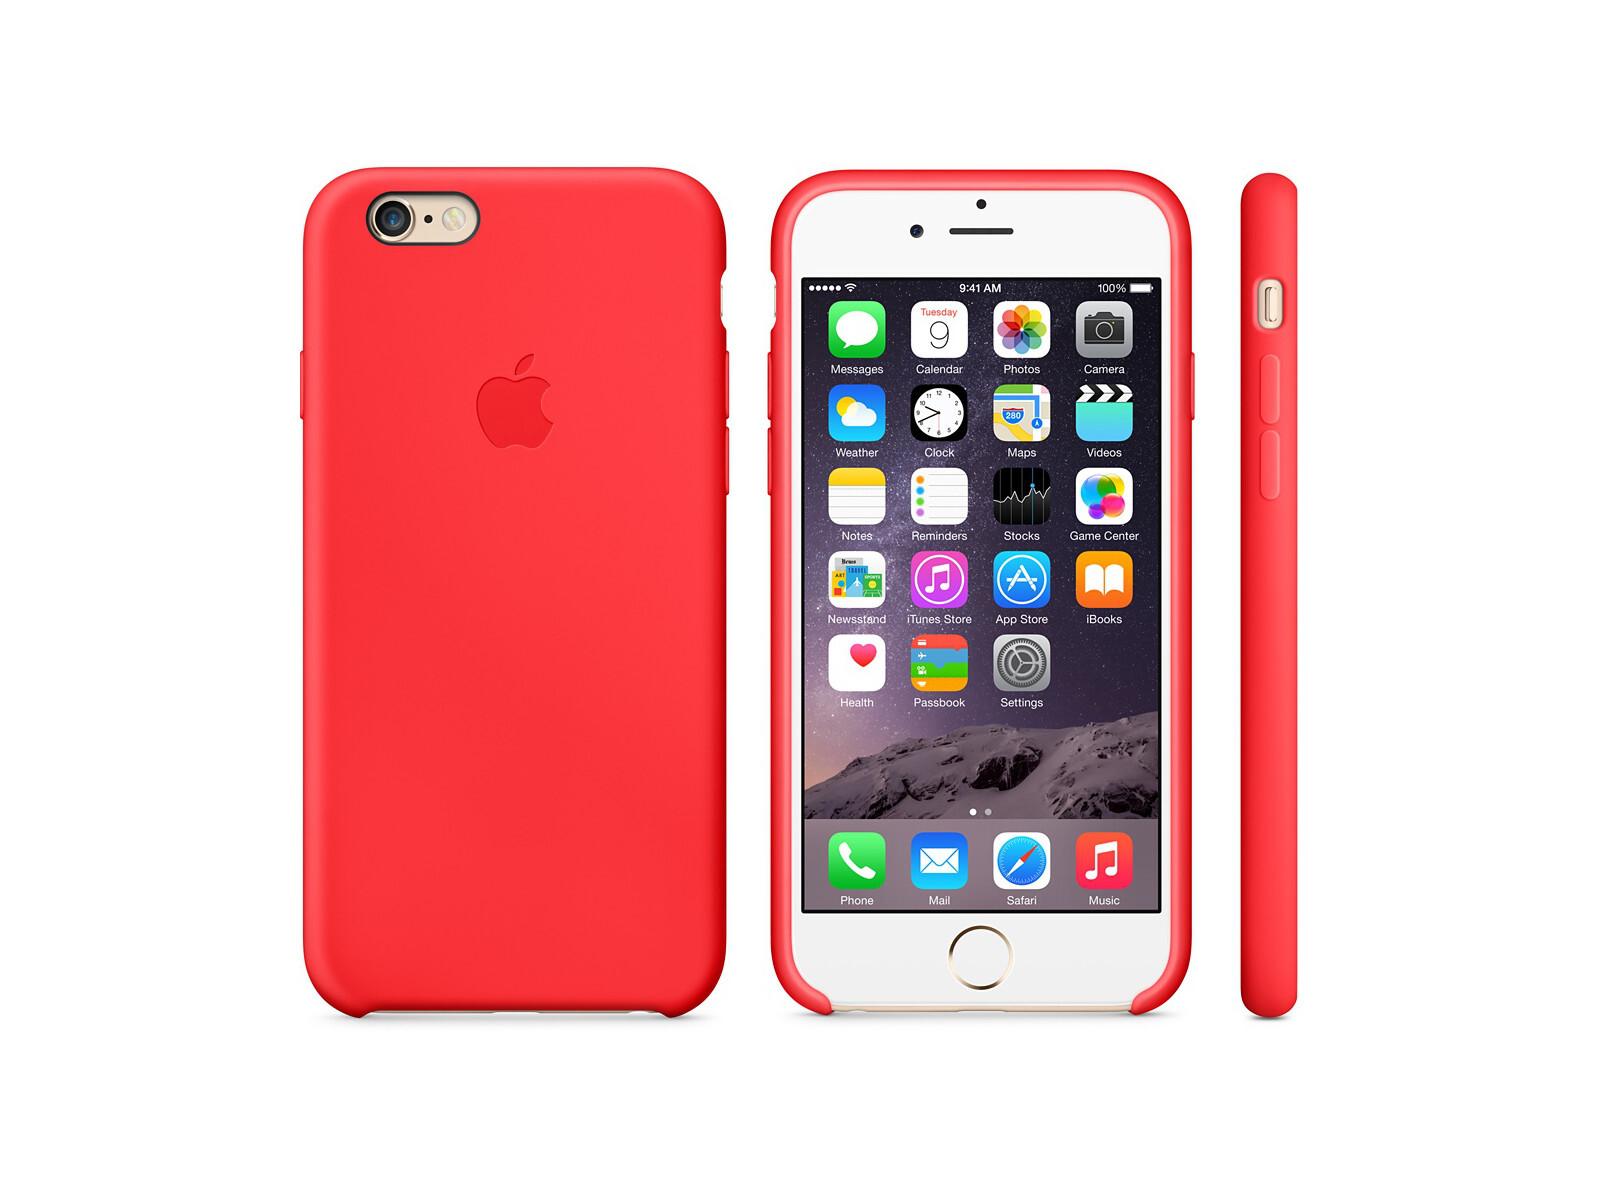 Custodia in Silicone per iPhone 6s Apple ($ 35)